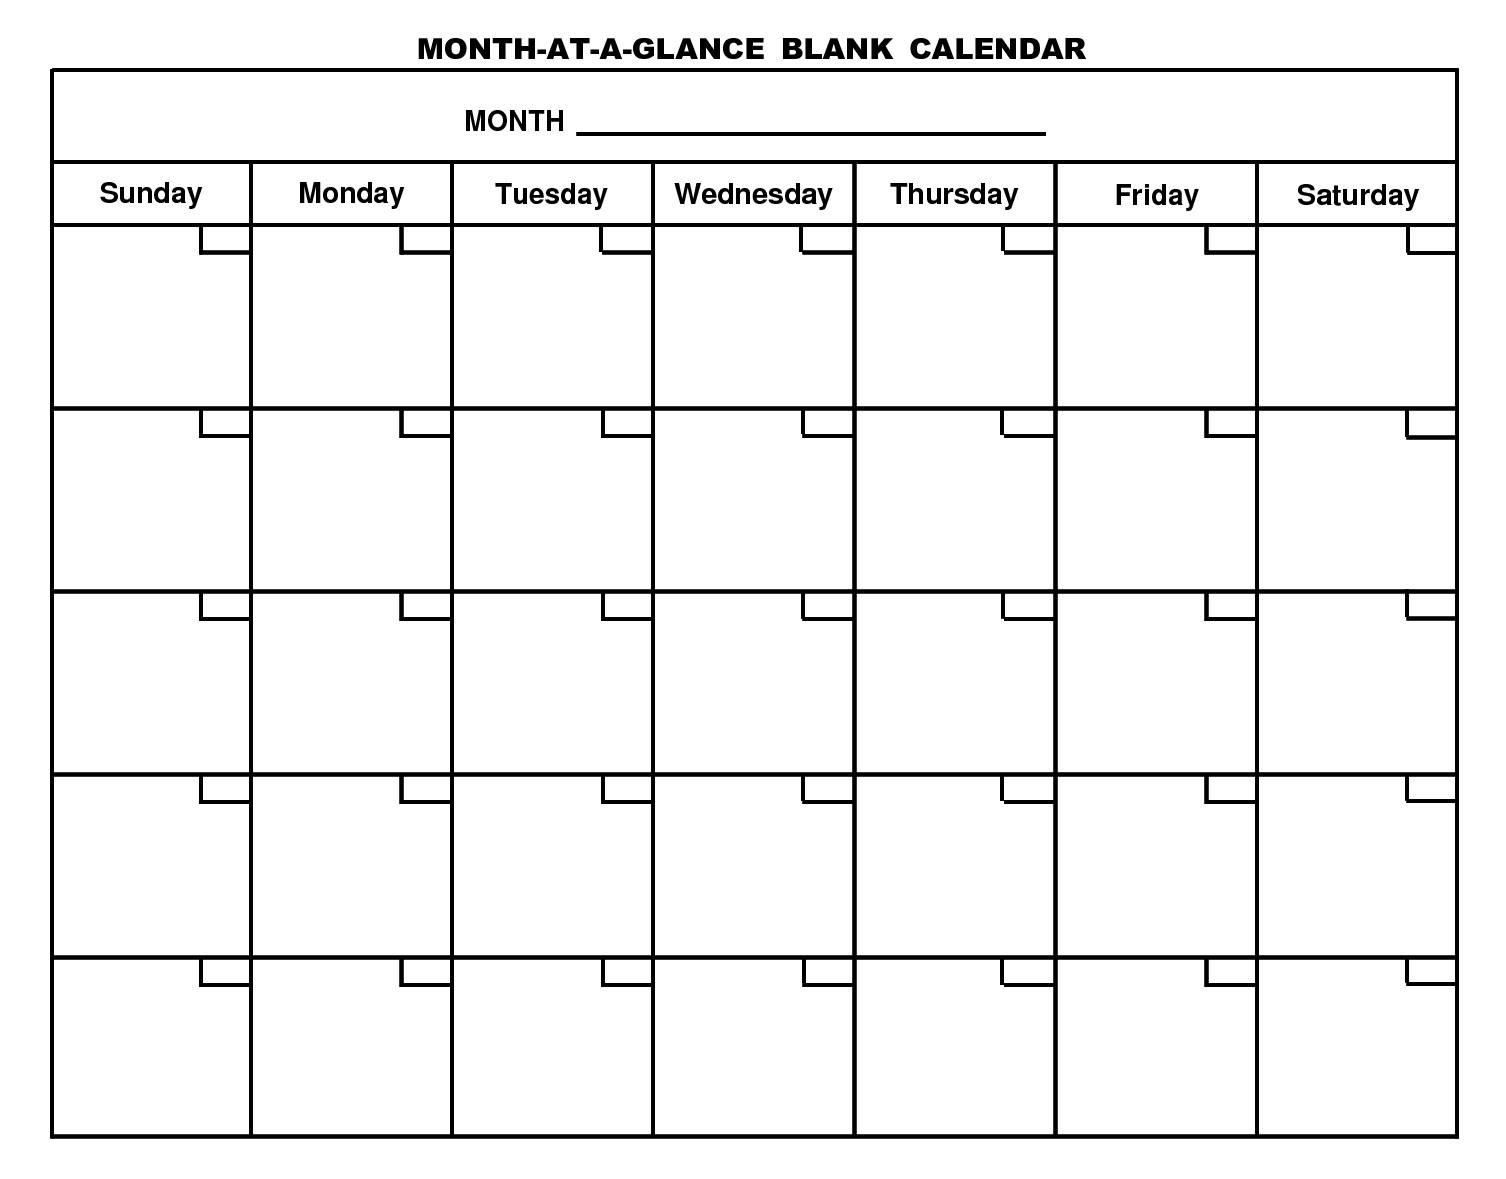 Month At A Glance Blank Calendar Template - Free Calendar